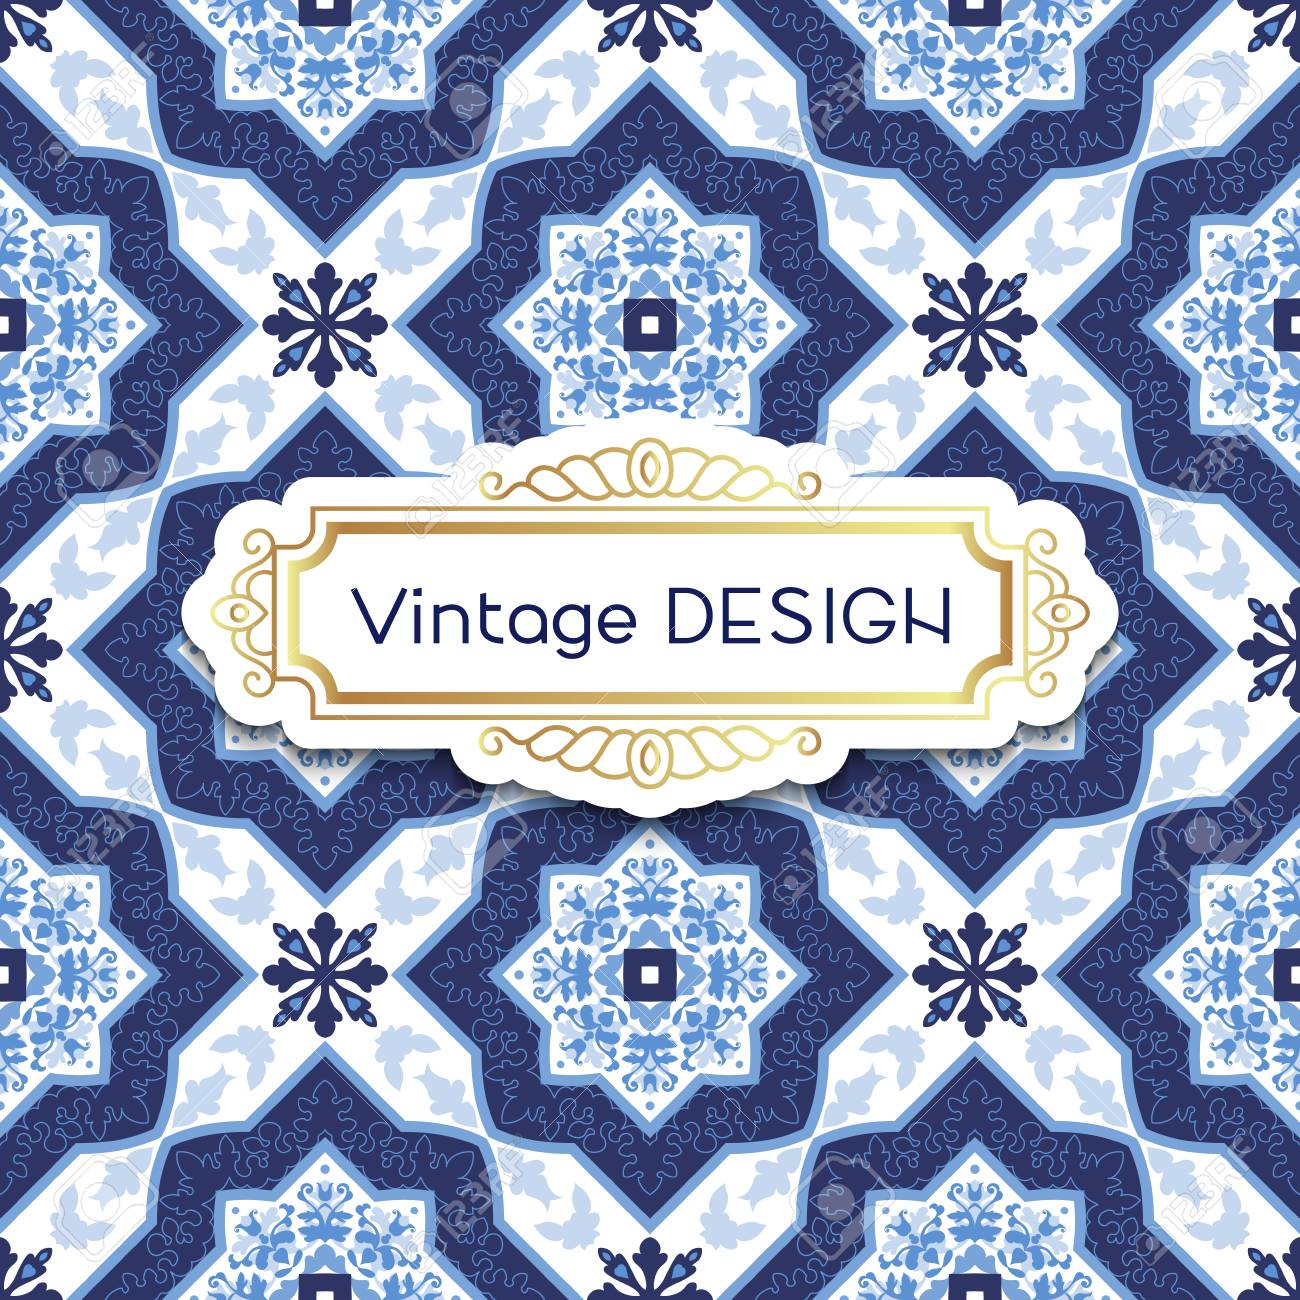 Antique, vintage background azulejos in Portuguese tiles style...